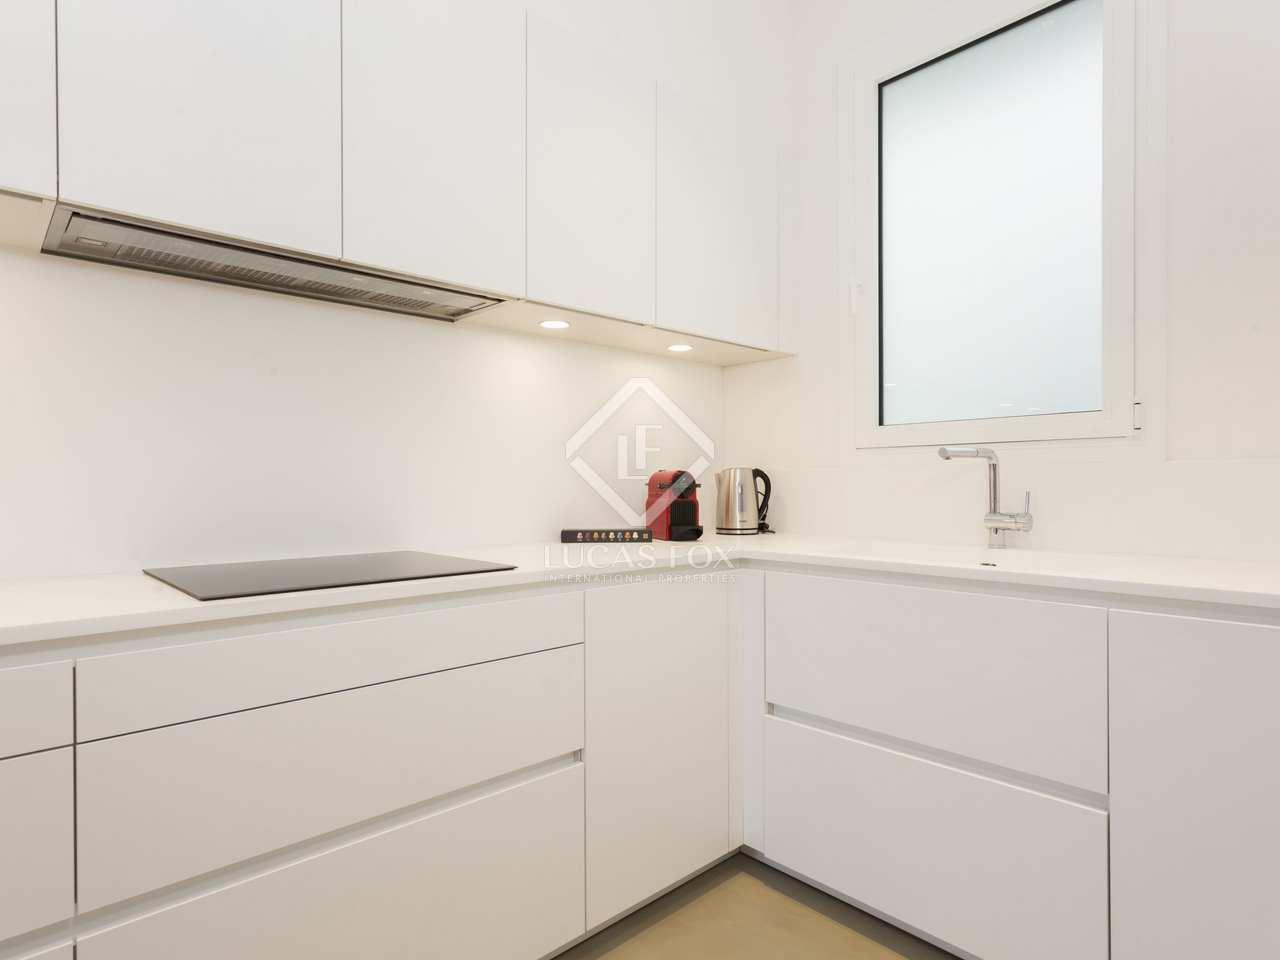 Renovated 2 bedroom apartment to rent in eixample barcelona - Calle casp barcelona ...